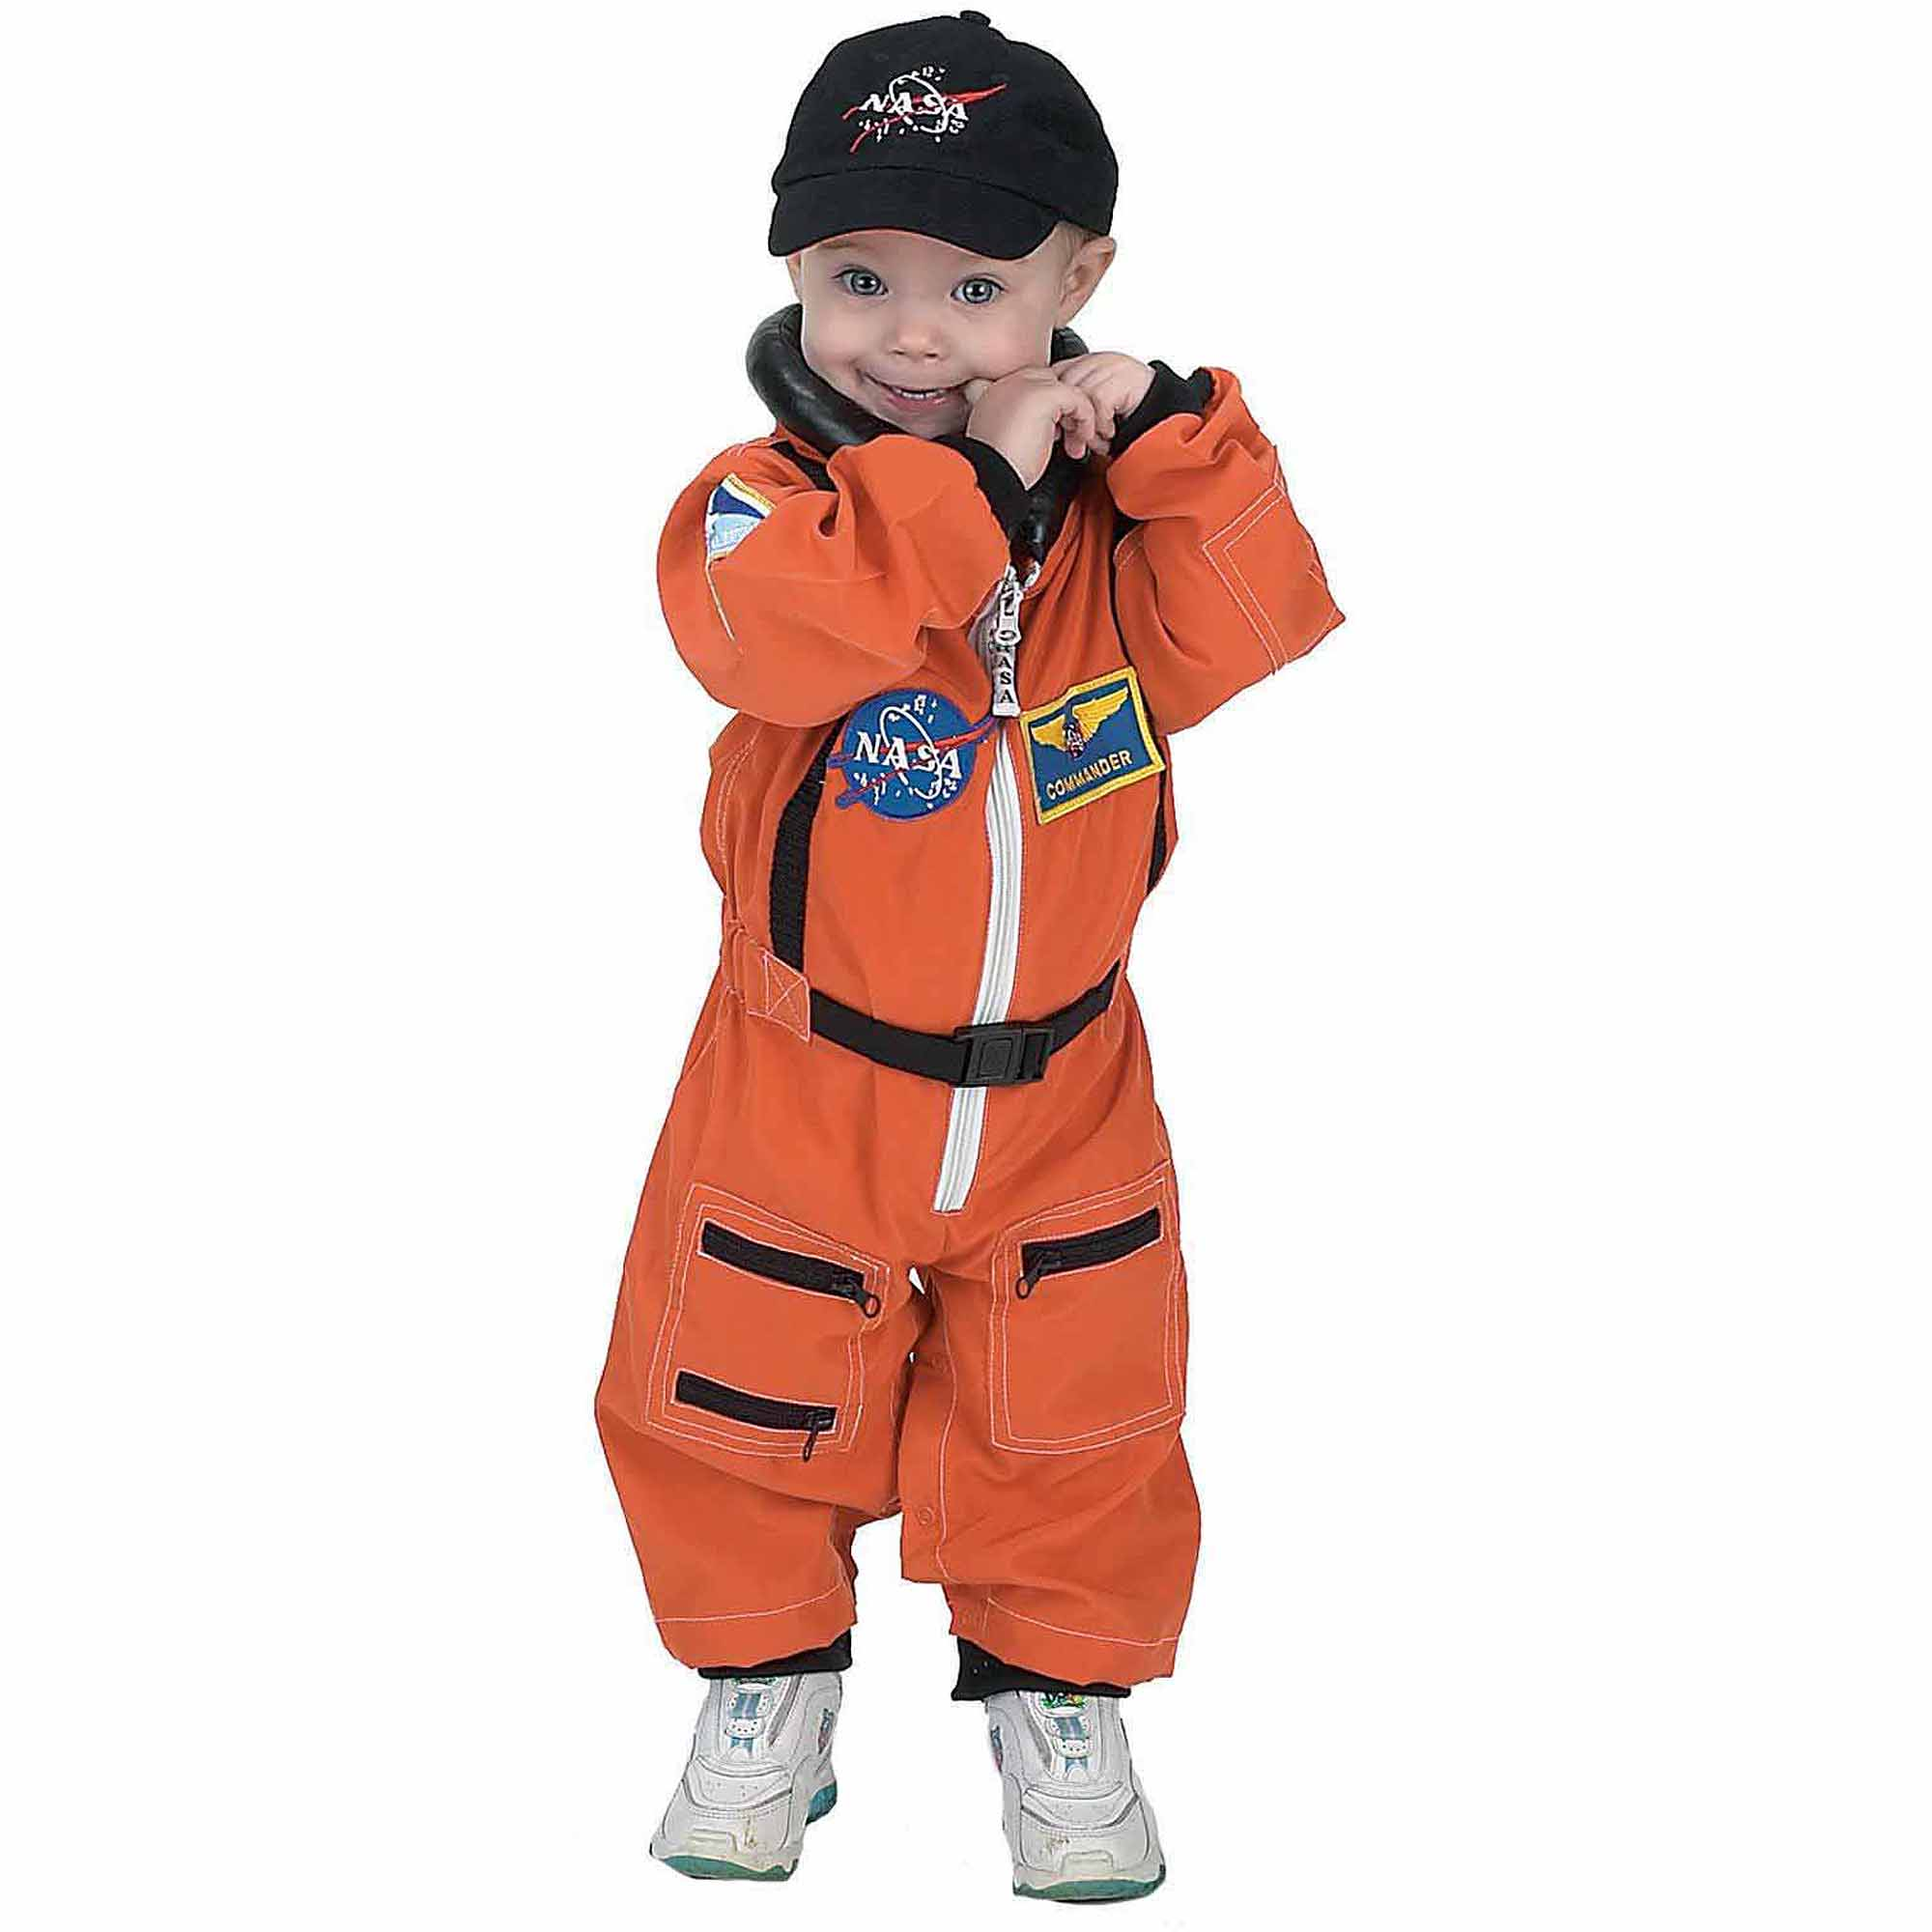 nasa orange jr astronaut suit toddler halloween costume size 12 18 months - Halloween Express Raleigh